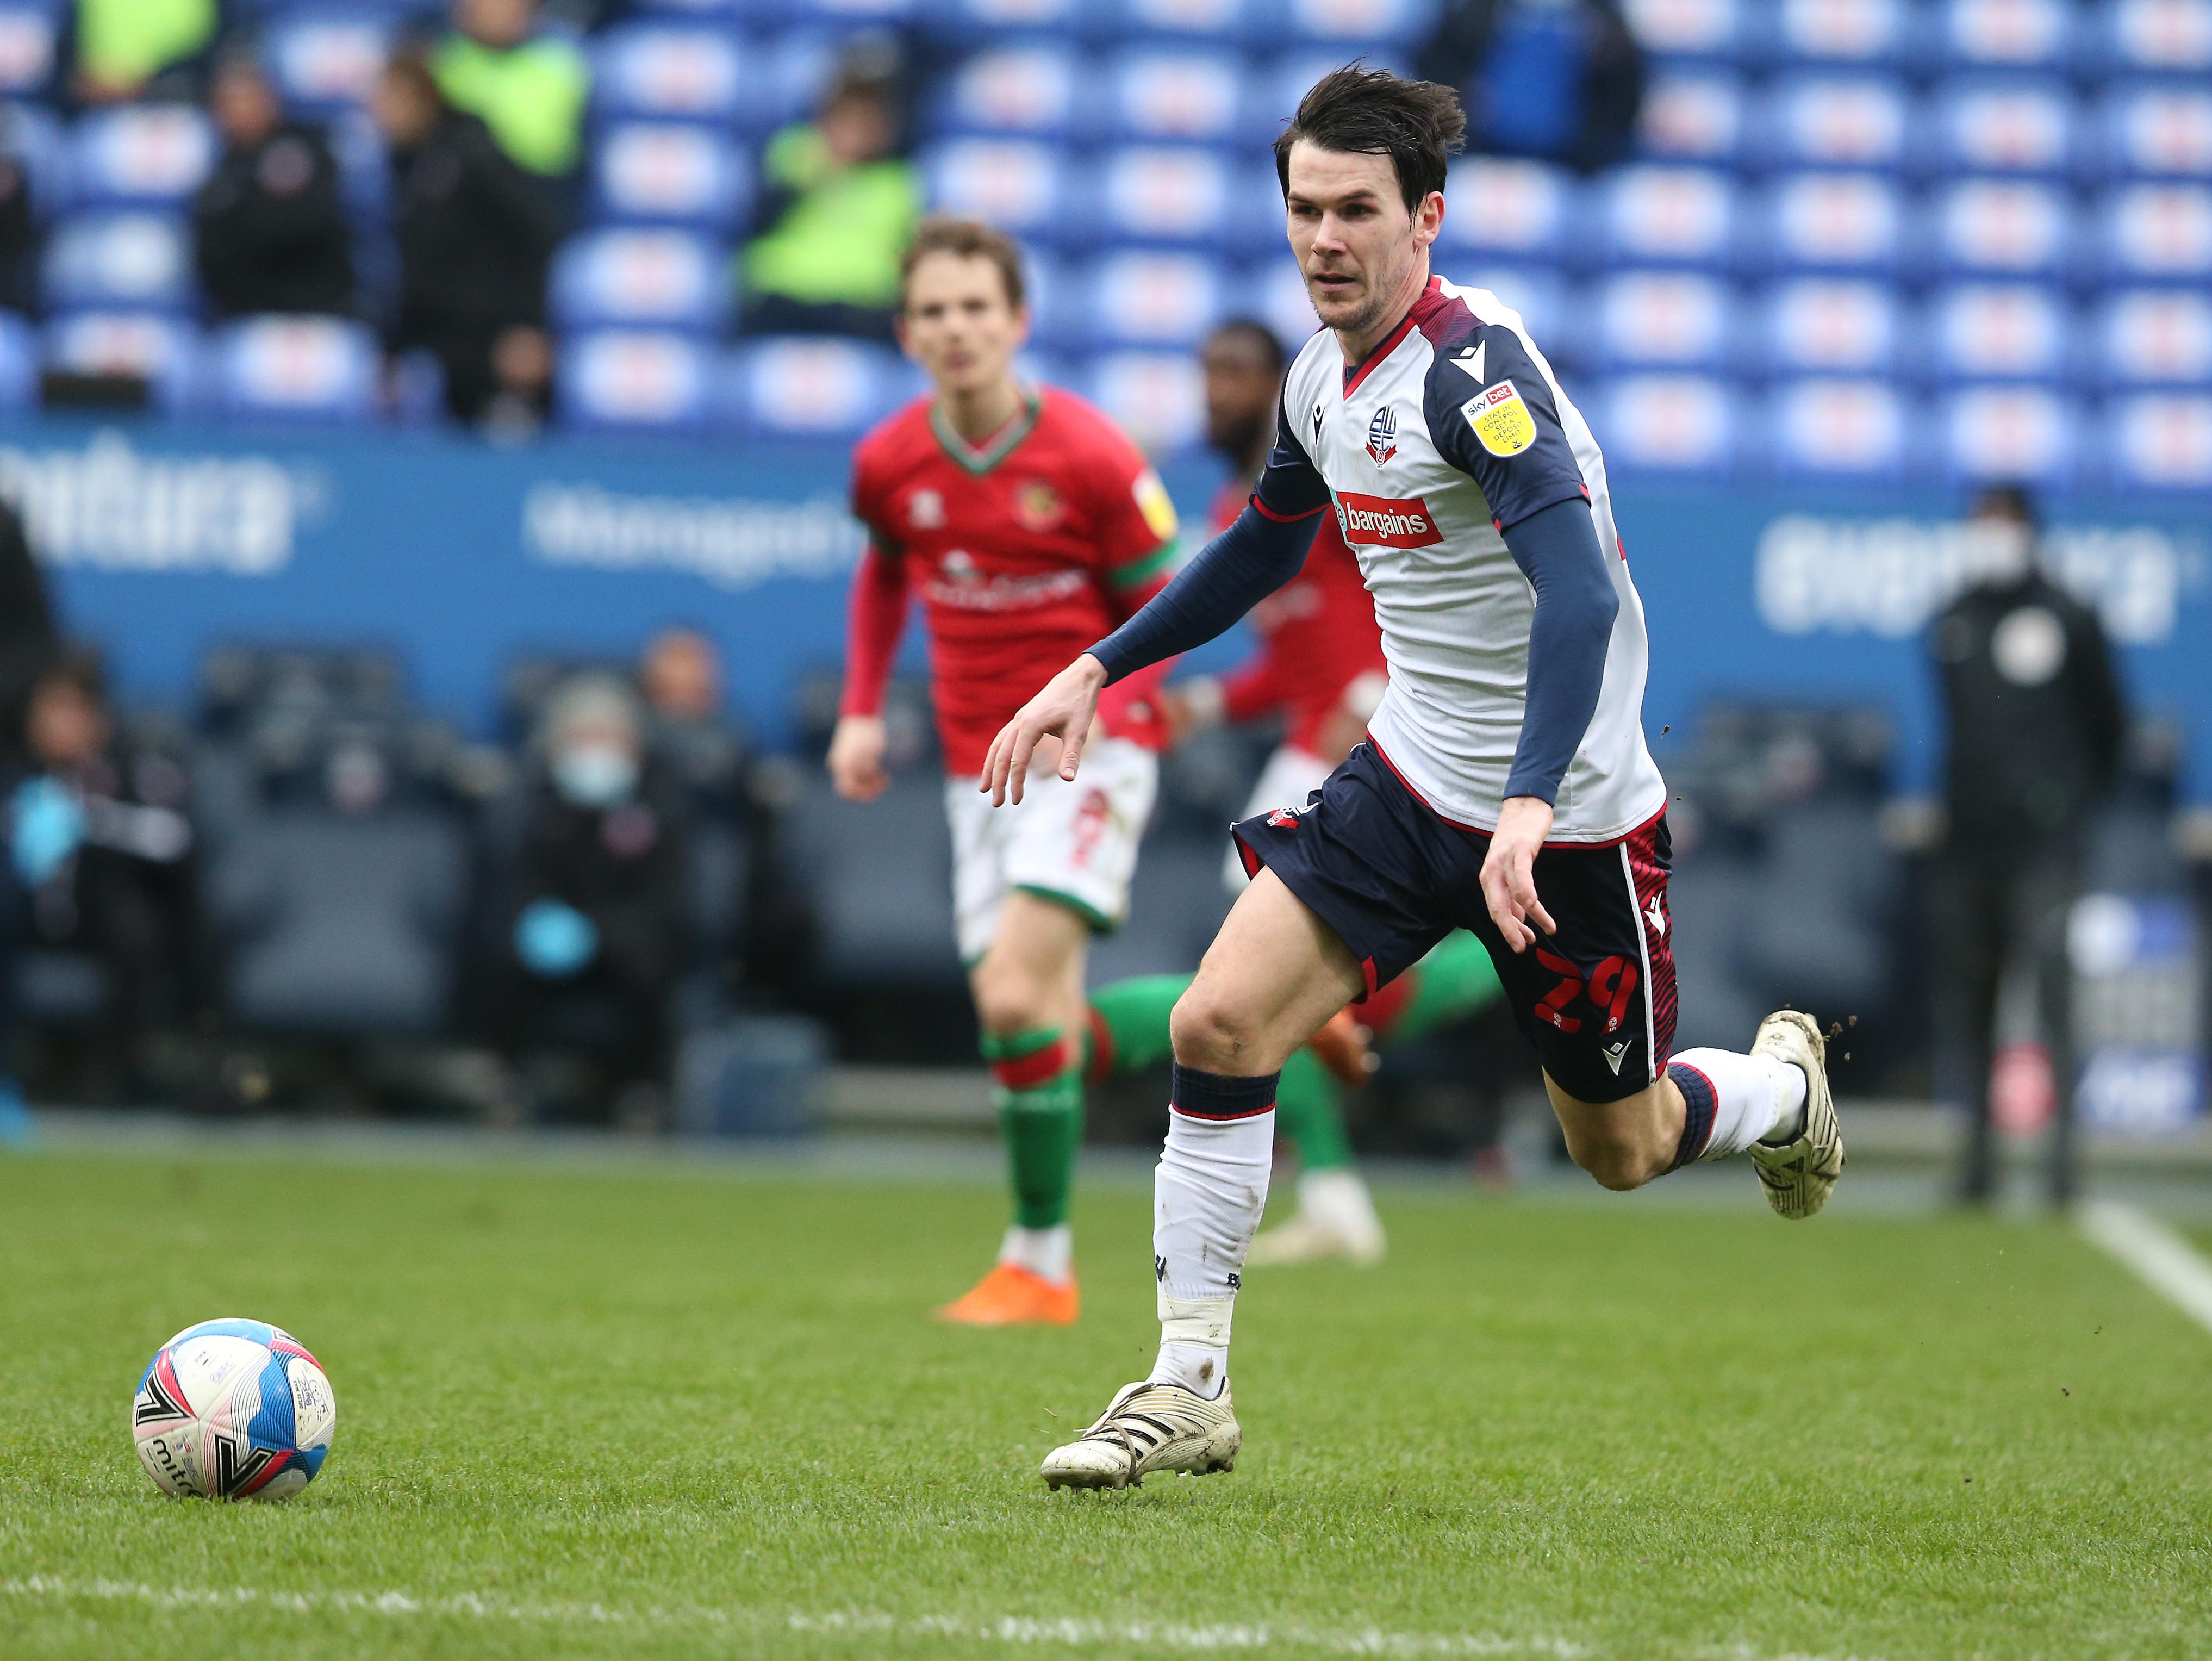 Bolton Wanderers v Walsall - Sky Bet League Two